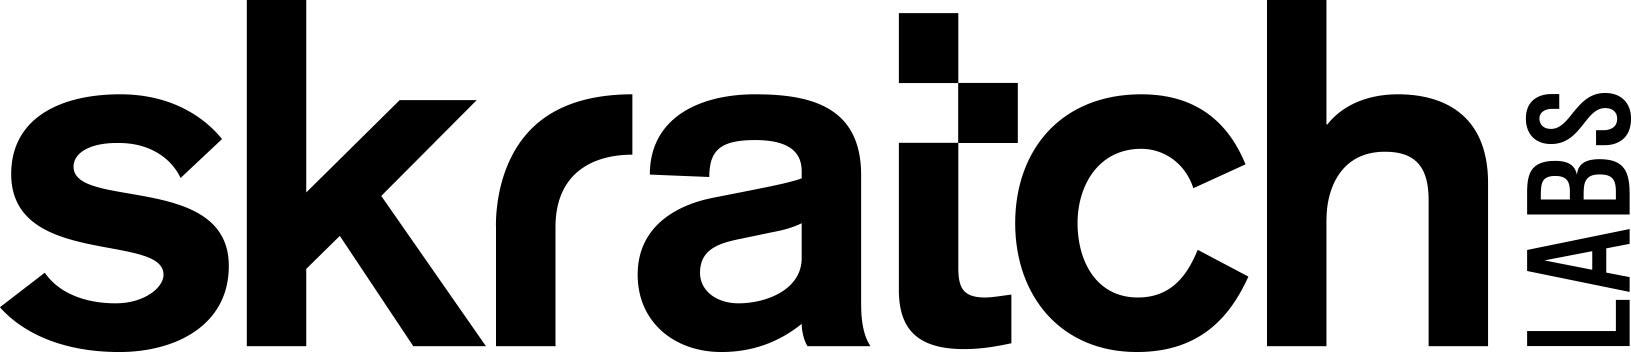 skratch_logo_black_notm.jpg